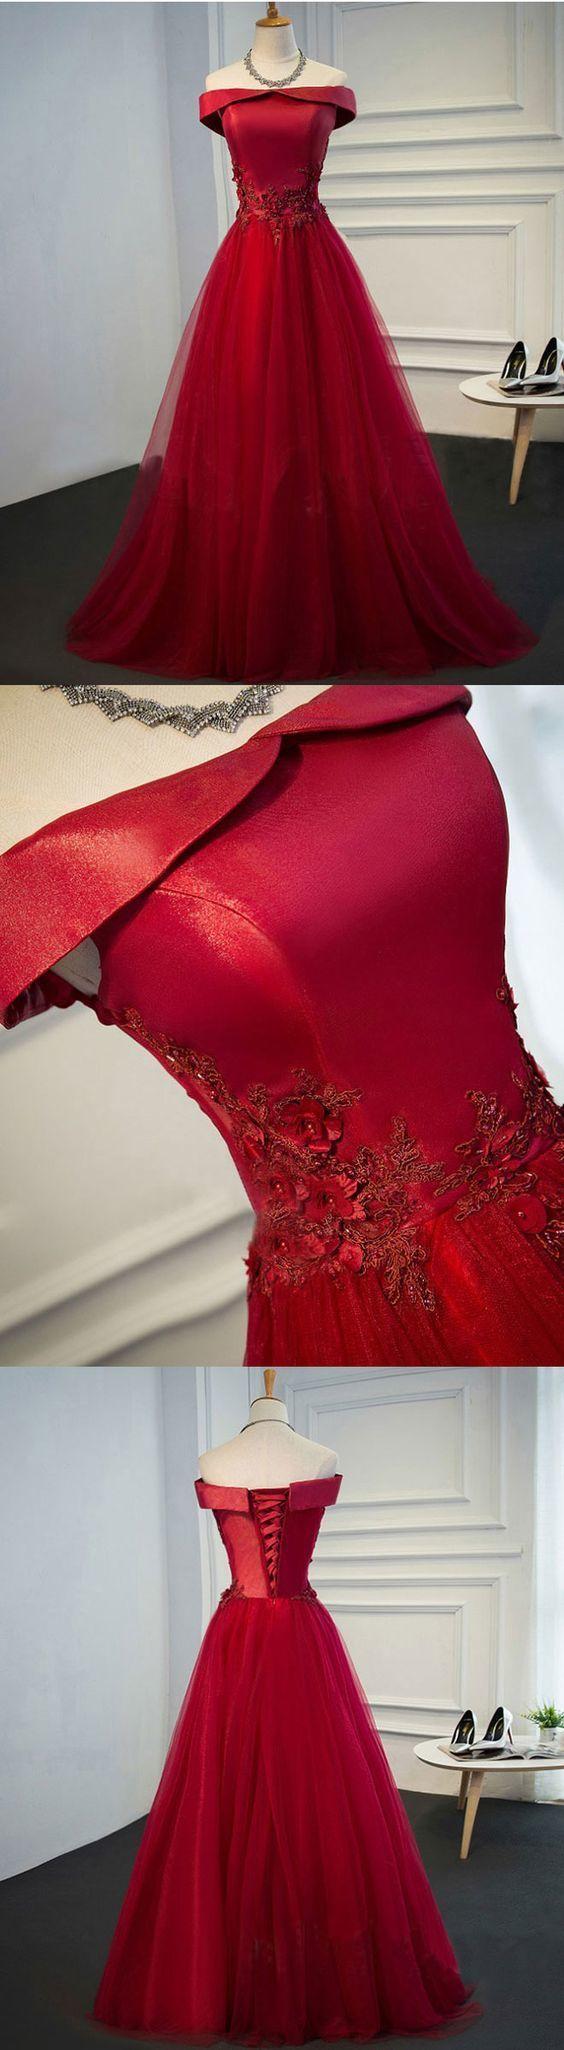 Burgundy lace tulle long prom dress off shoulder evening dress in